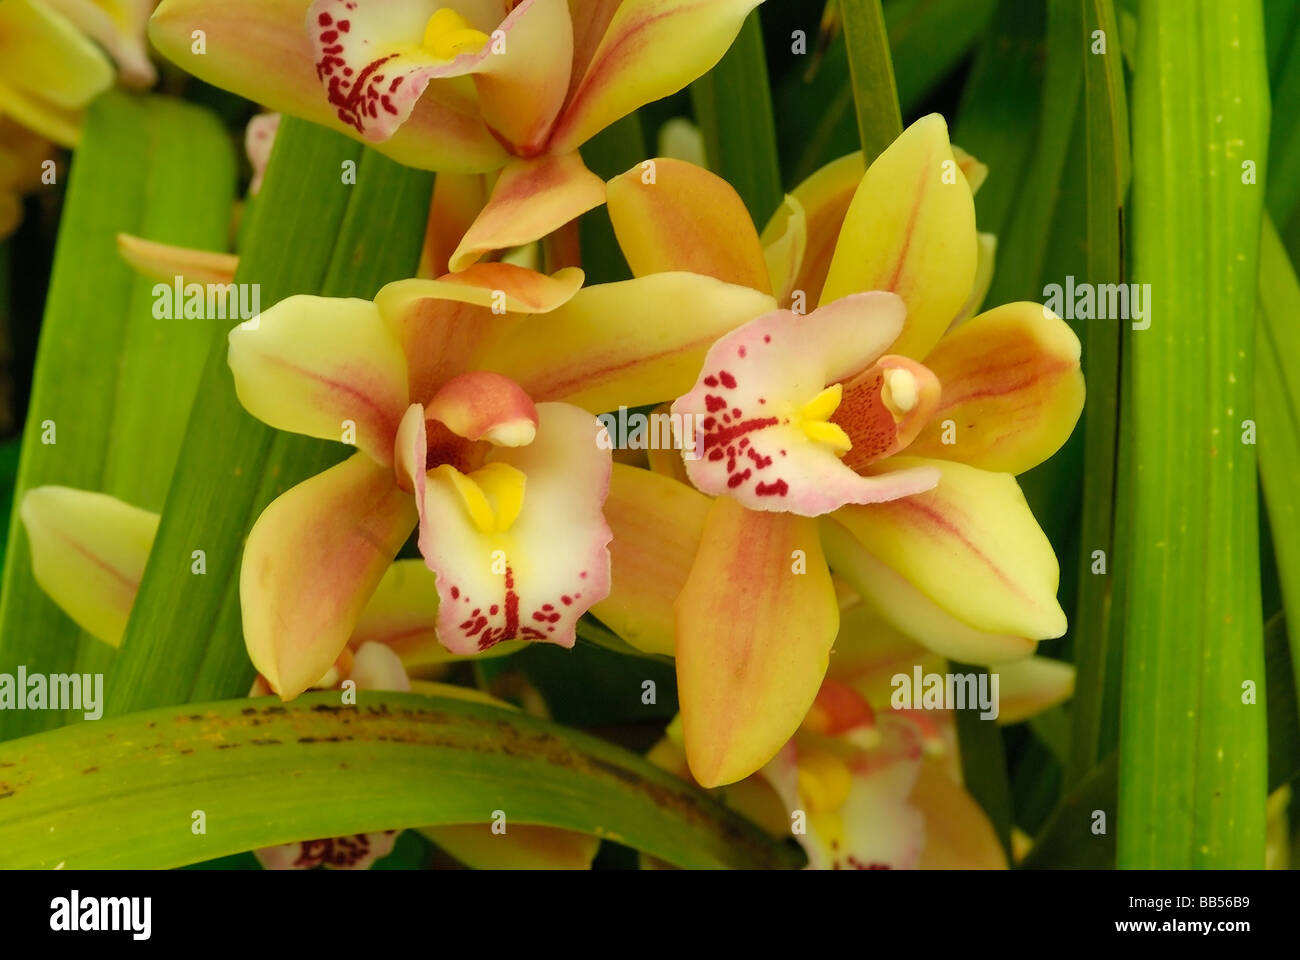 Cymbidium SP. Hybrid Orchidaceae Orchideen Blumen Blume Pflanze Pflanzen Hortocultural Horizontal Roberto Nistri Stockbild